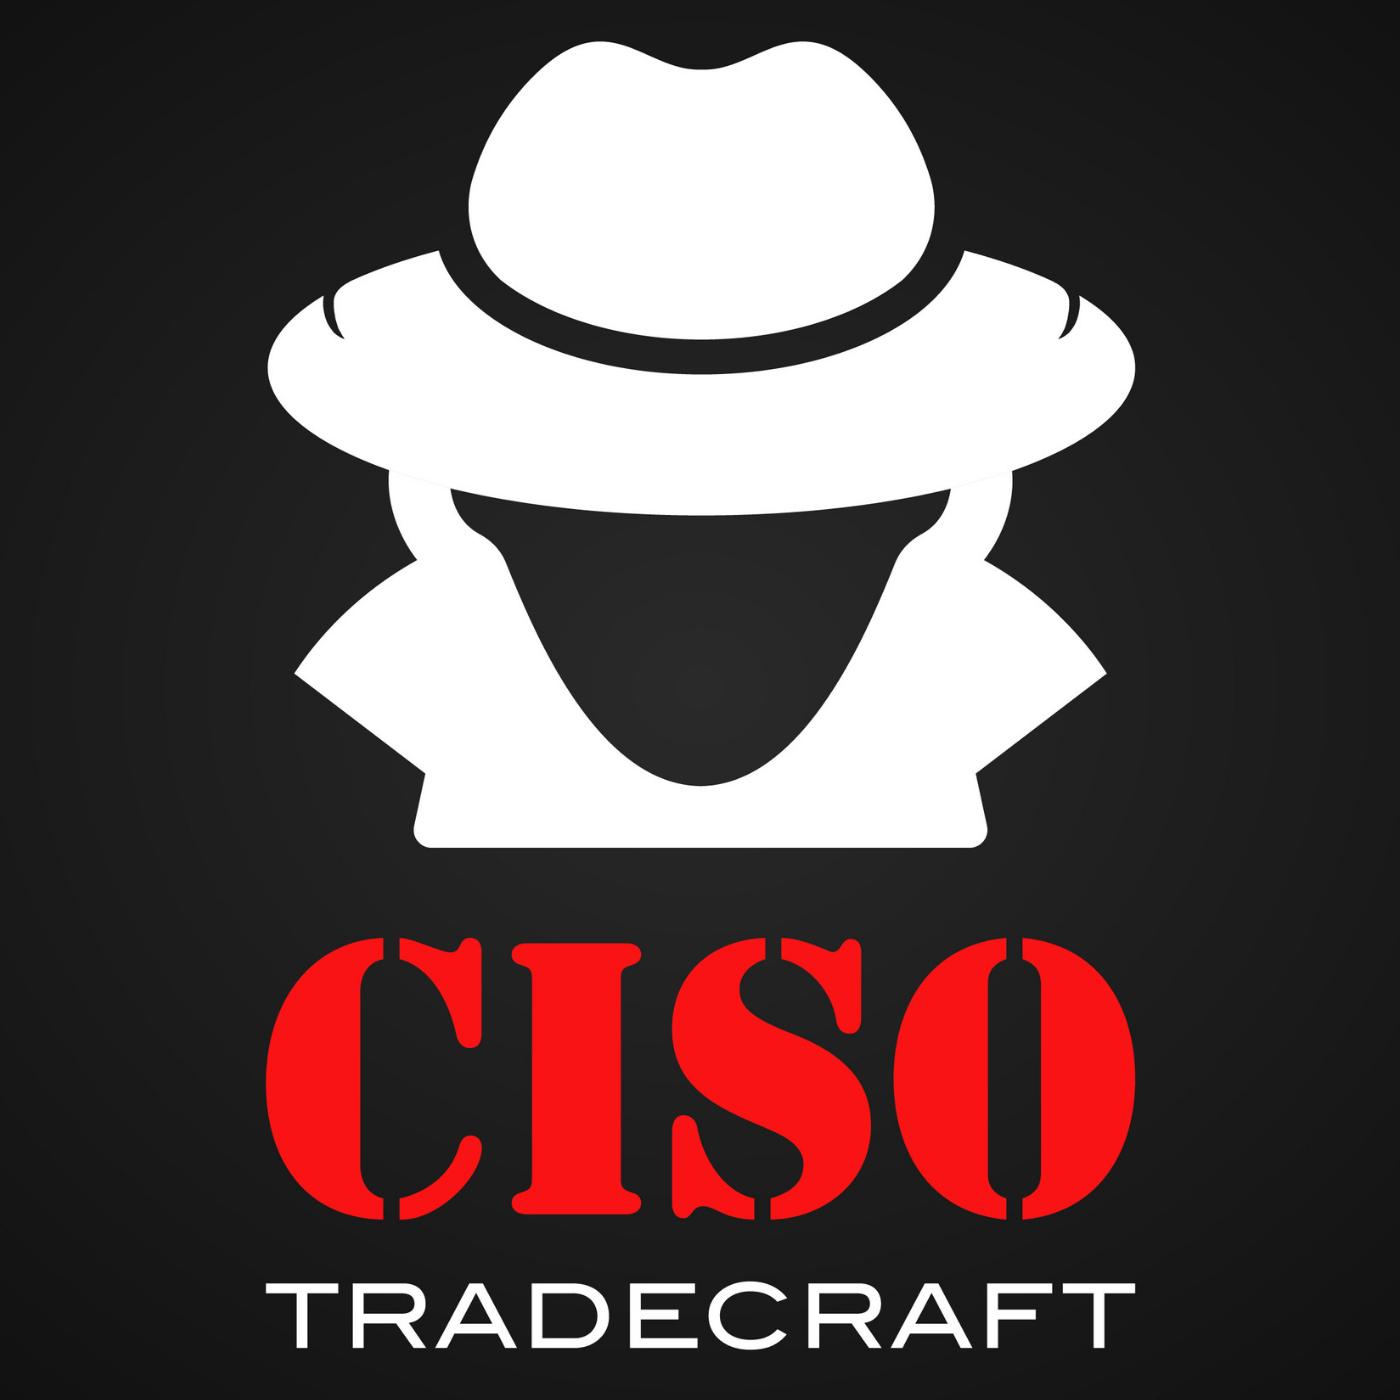 CISO Tradecraft Podcast Logo